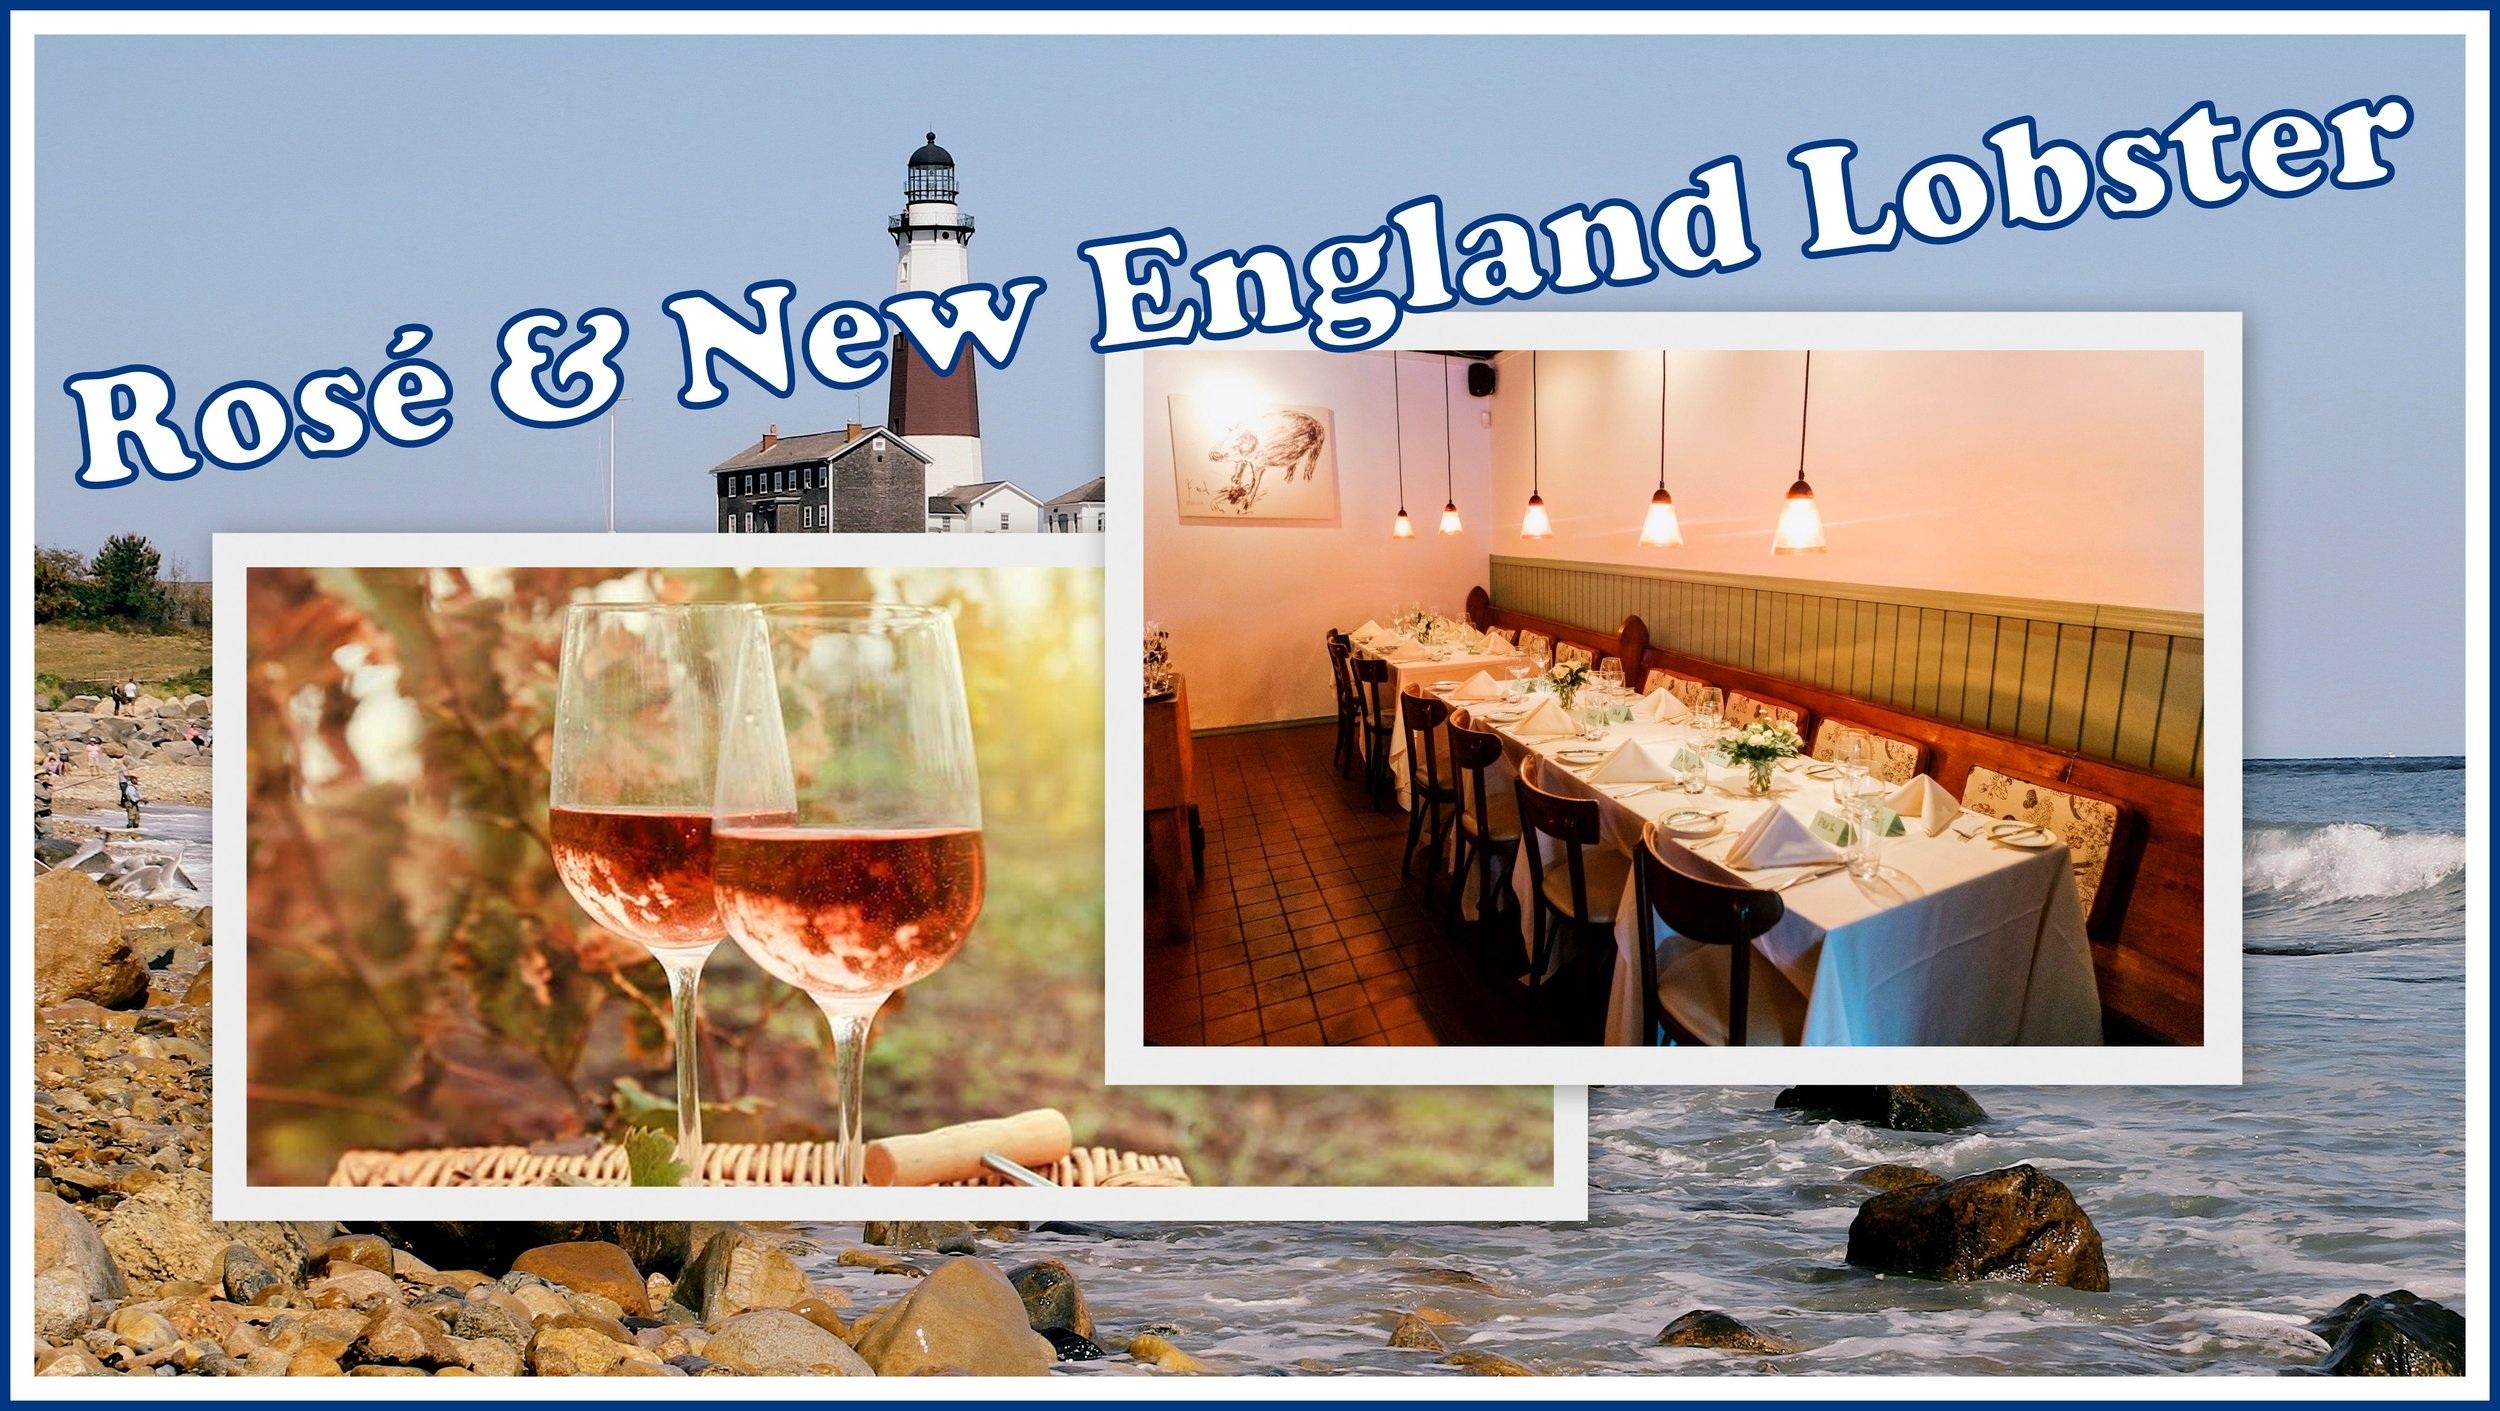 Rose+%26+New+England+Lobster.jpg